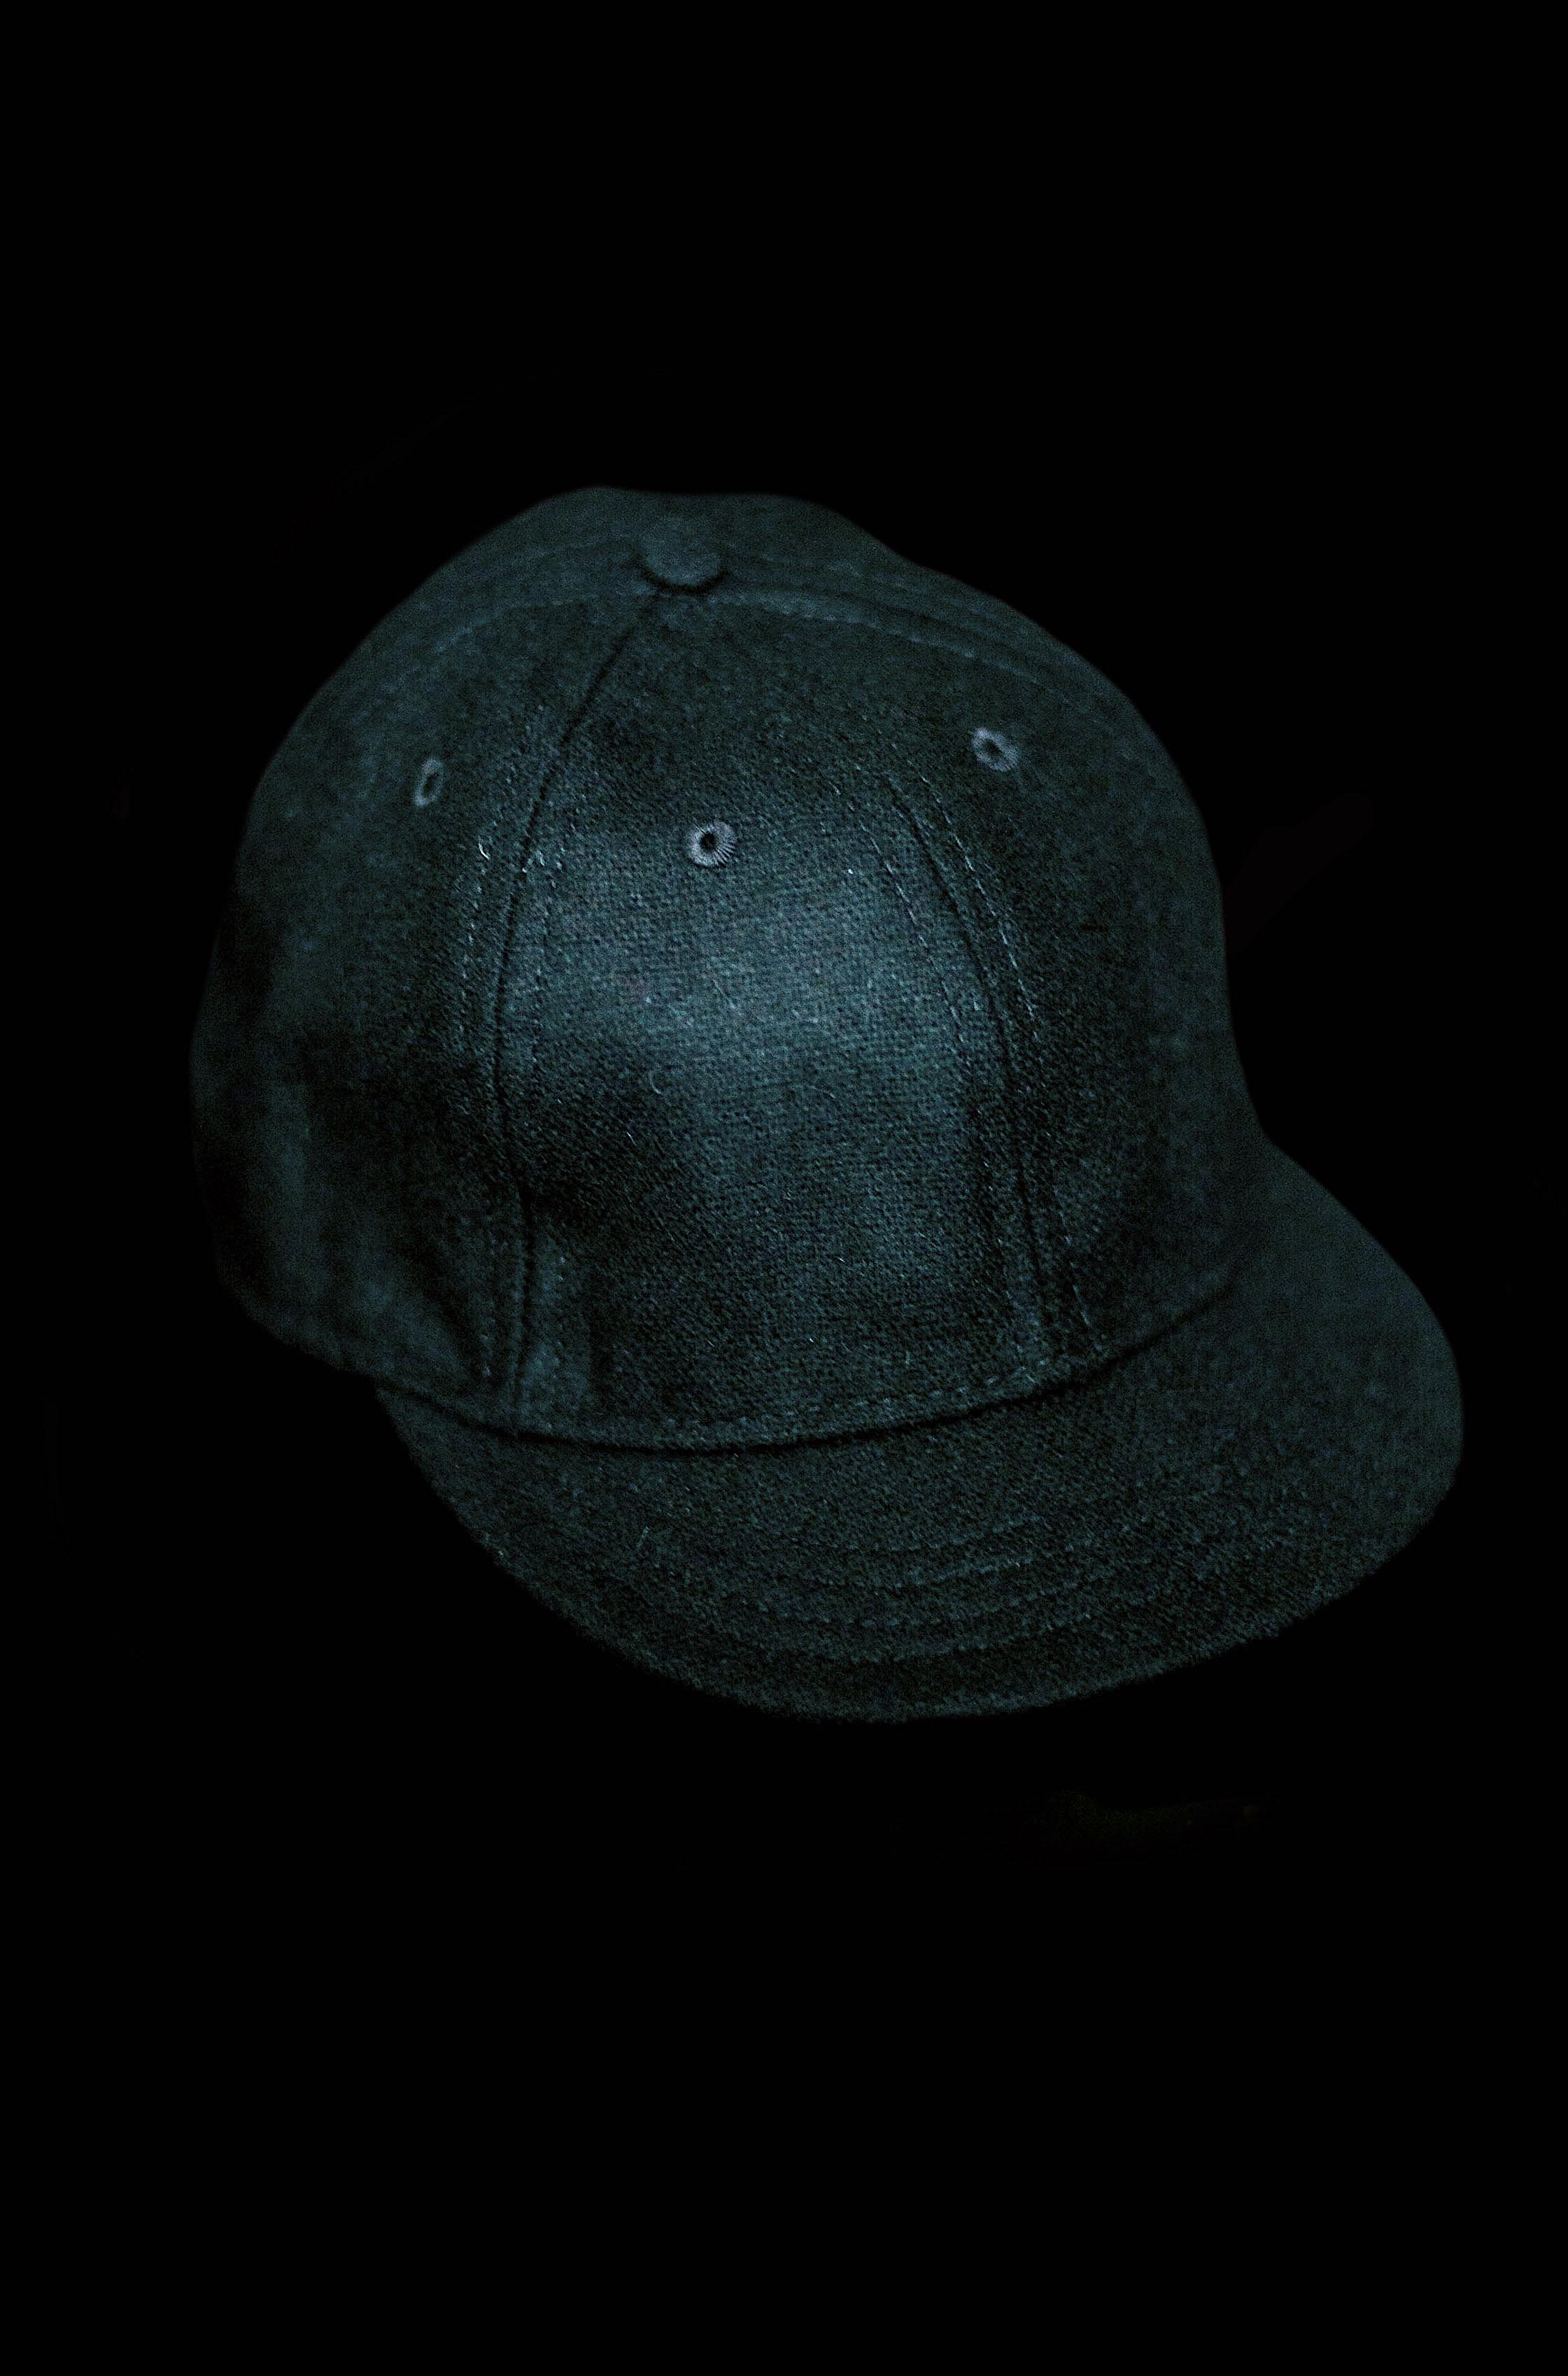 458e499c526 Bryceland s x ICC Ball Cap Black